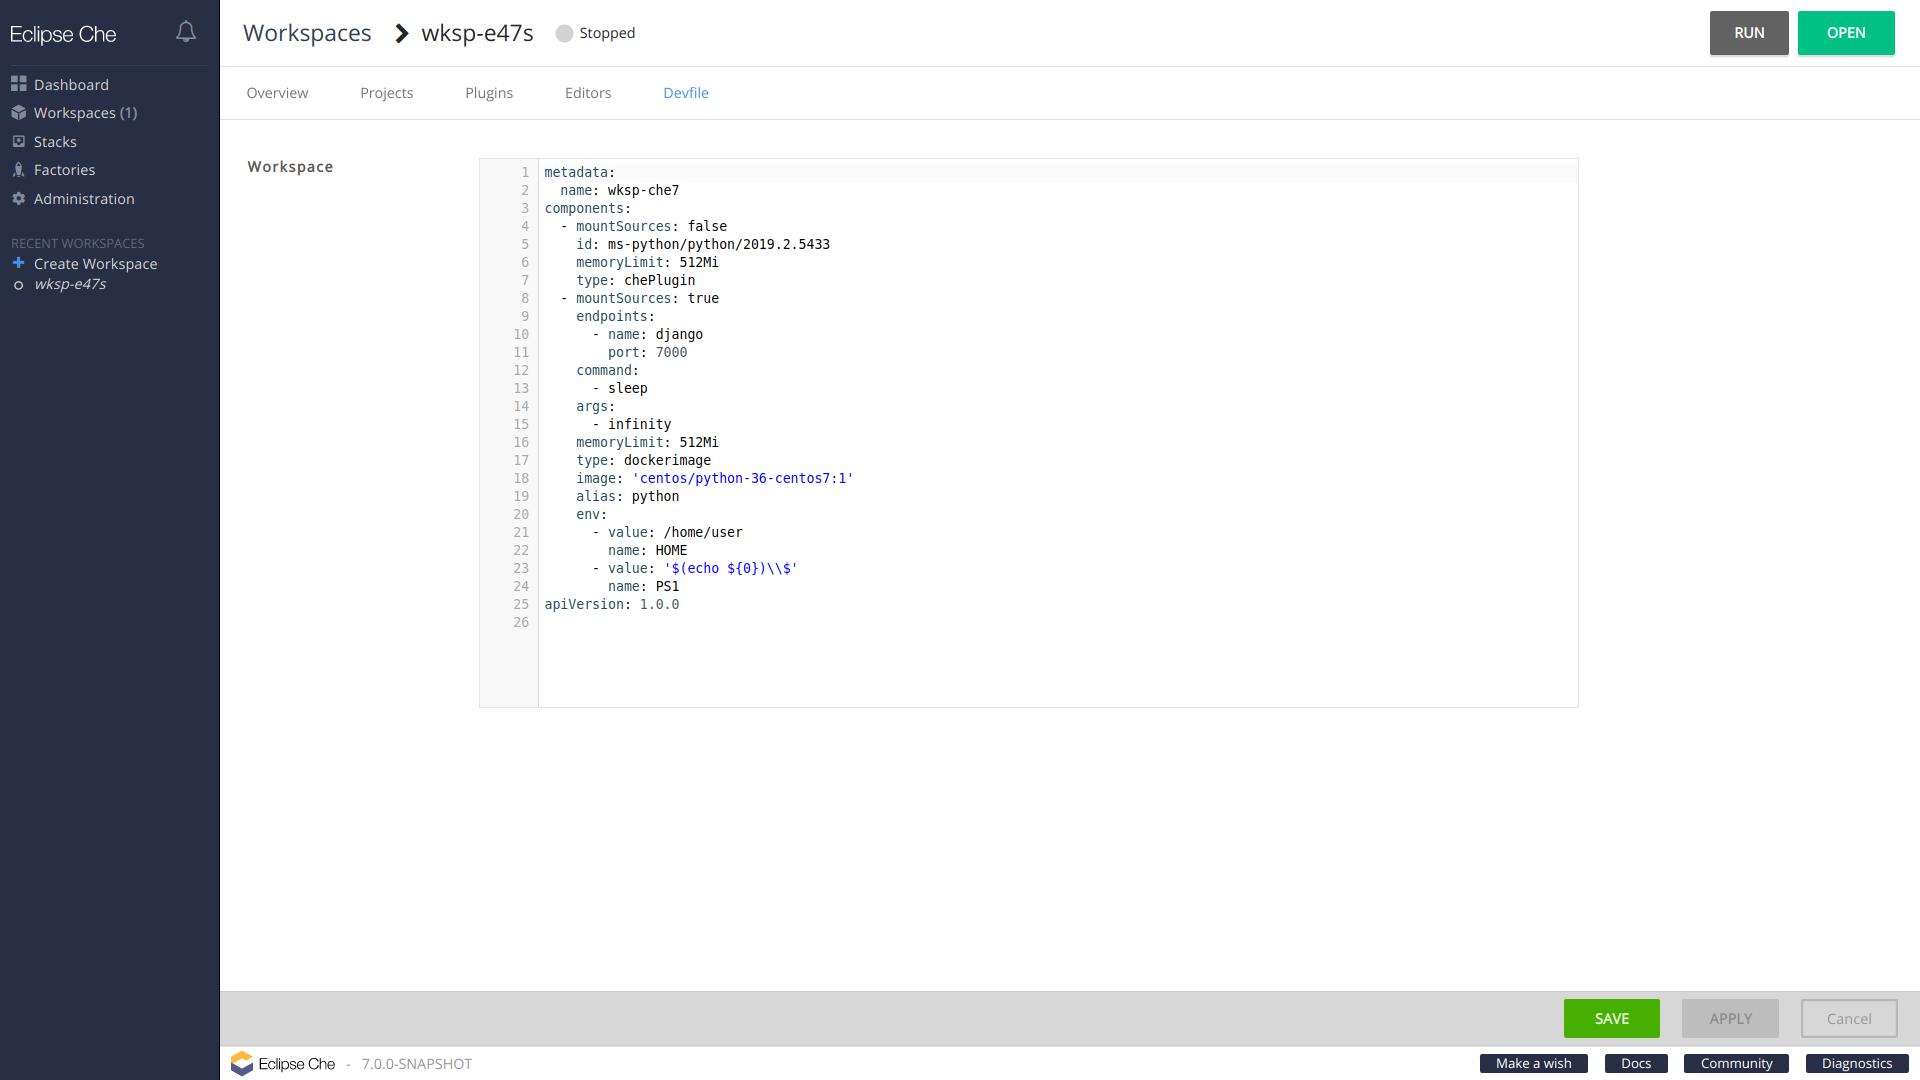 workspace devfile tab